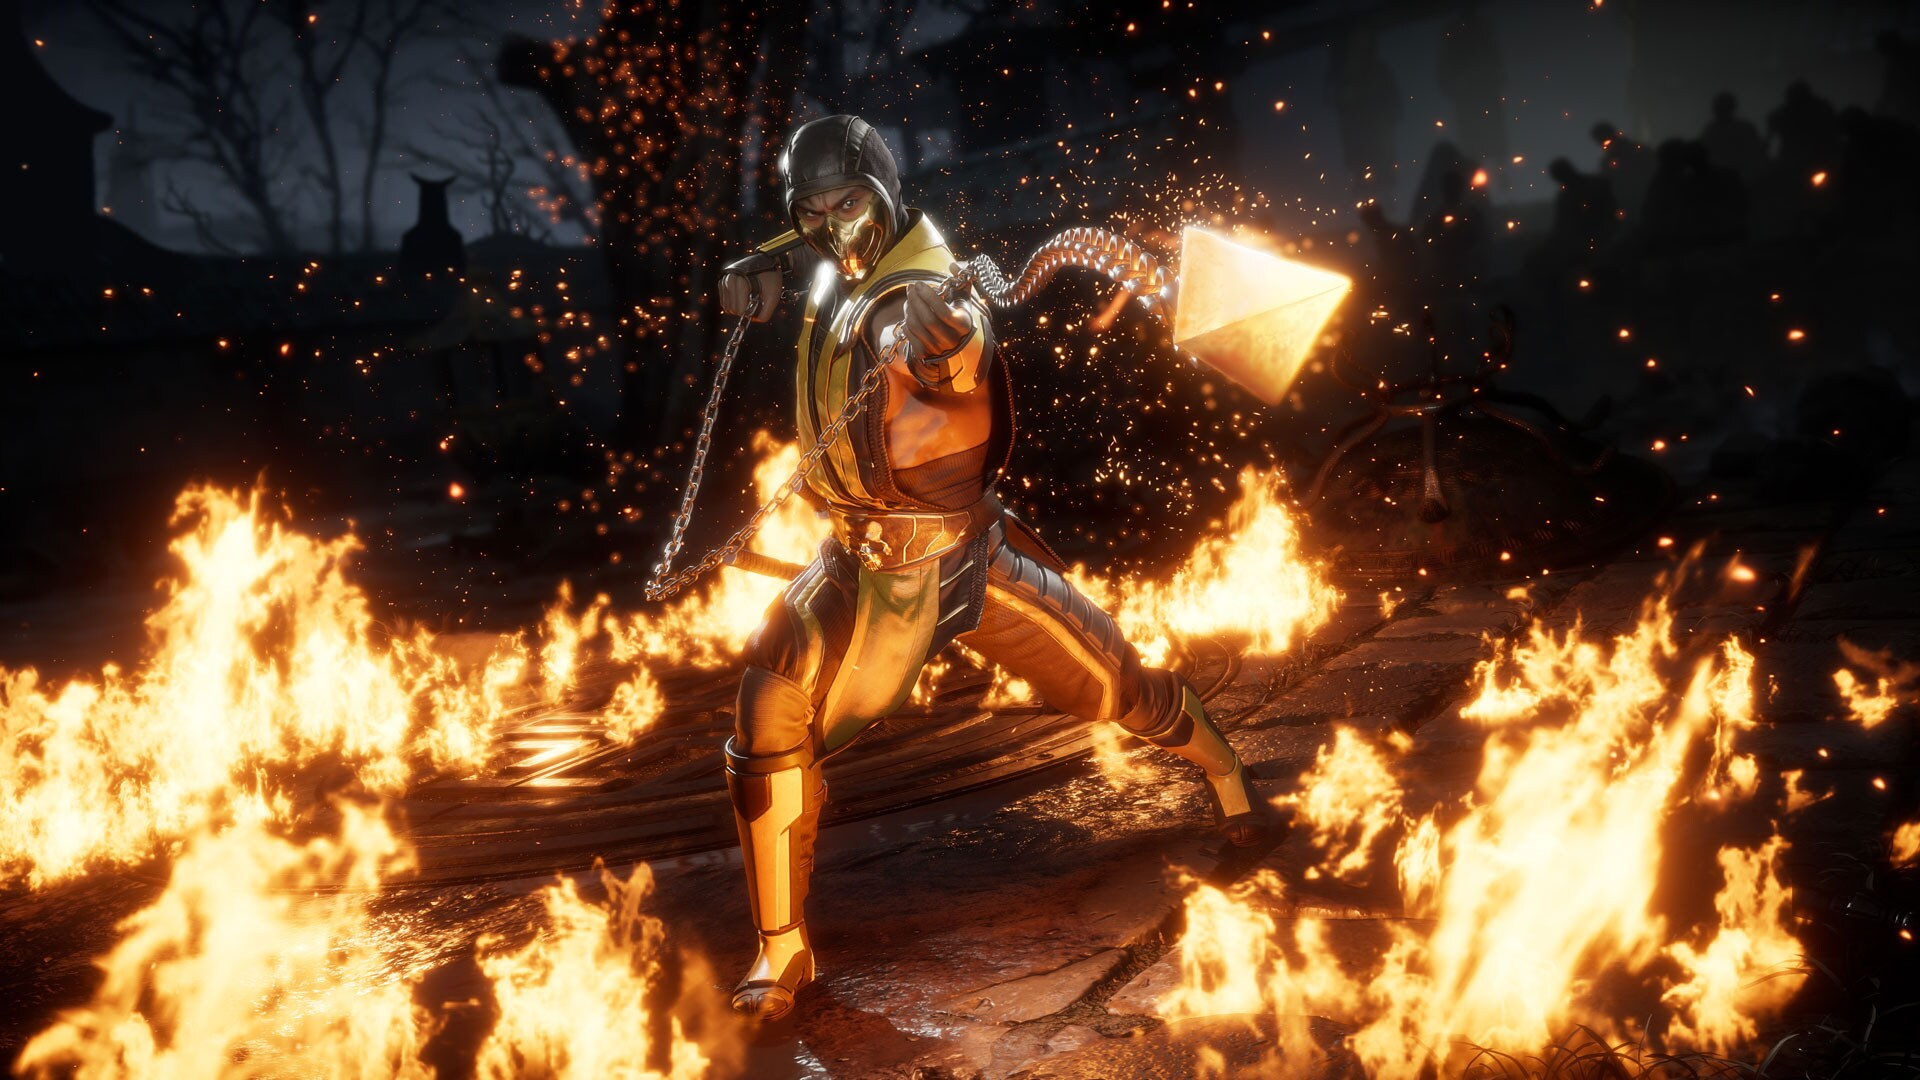 Mortal Kombat 11 | Ultimate Edition (Nintendo Switch) - Nintendo Key - EUROPE - 4